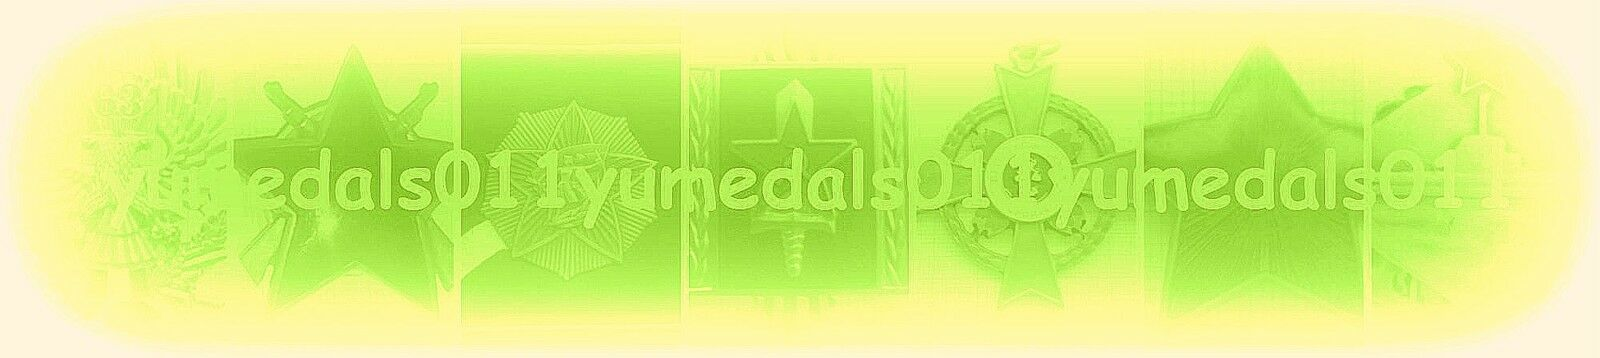 yumedals011